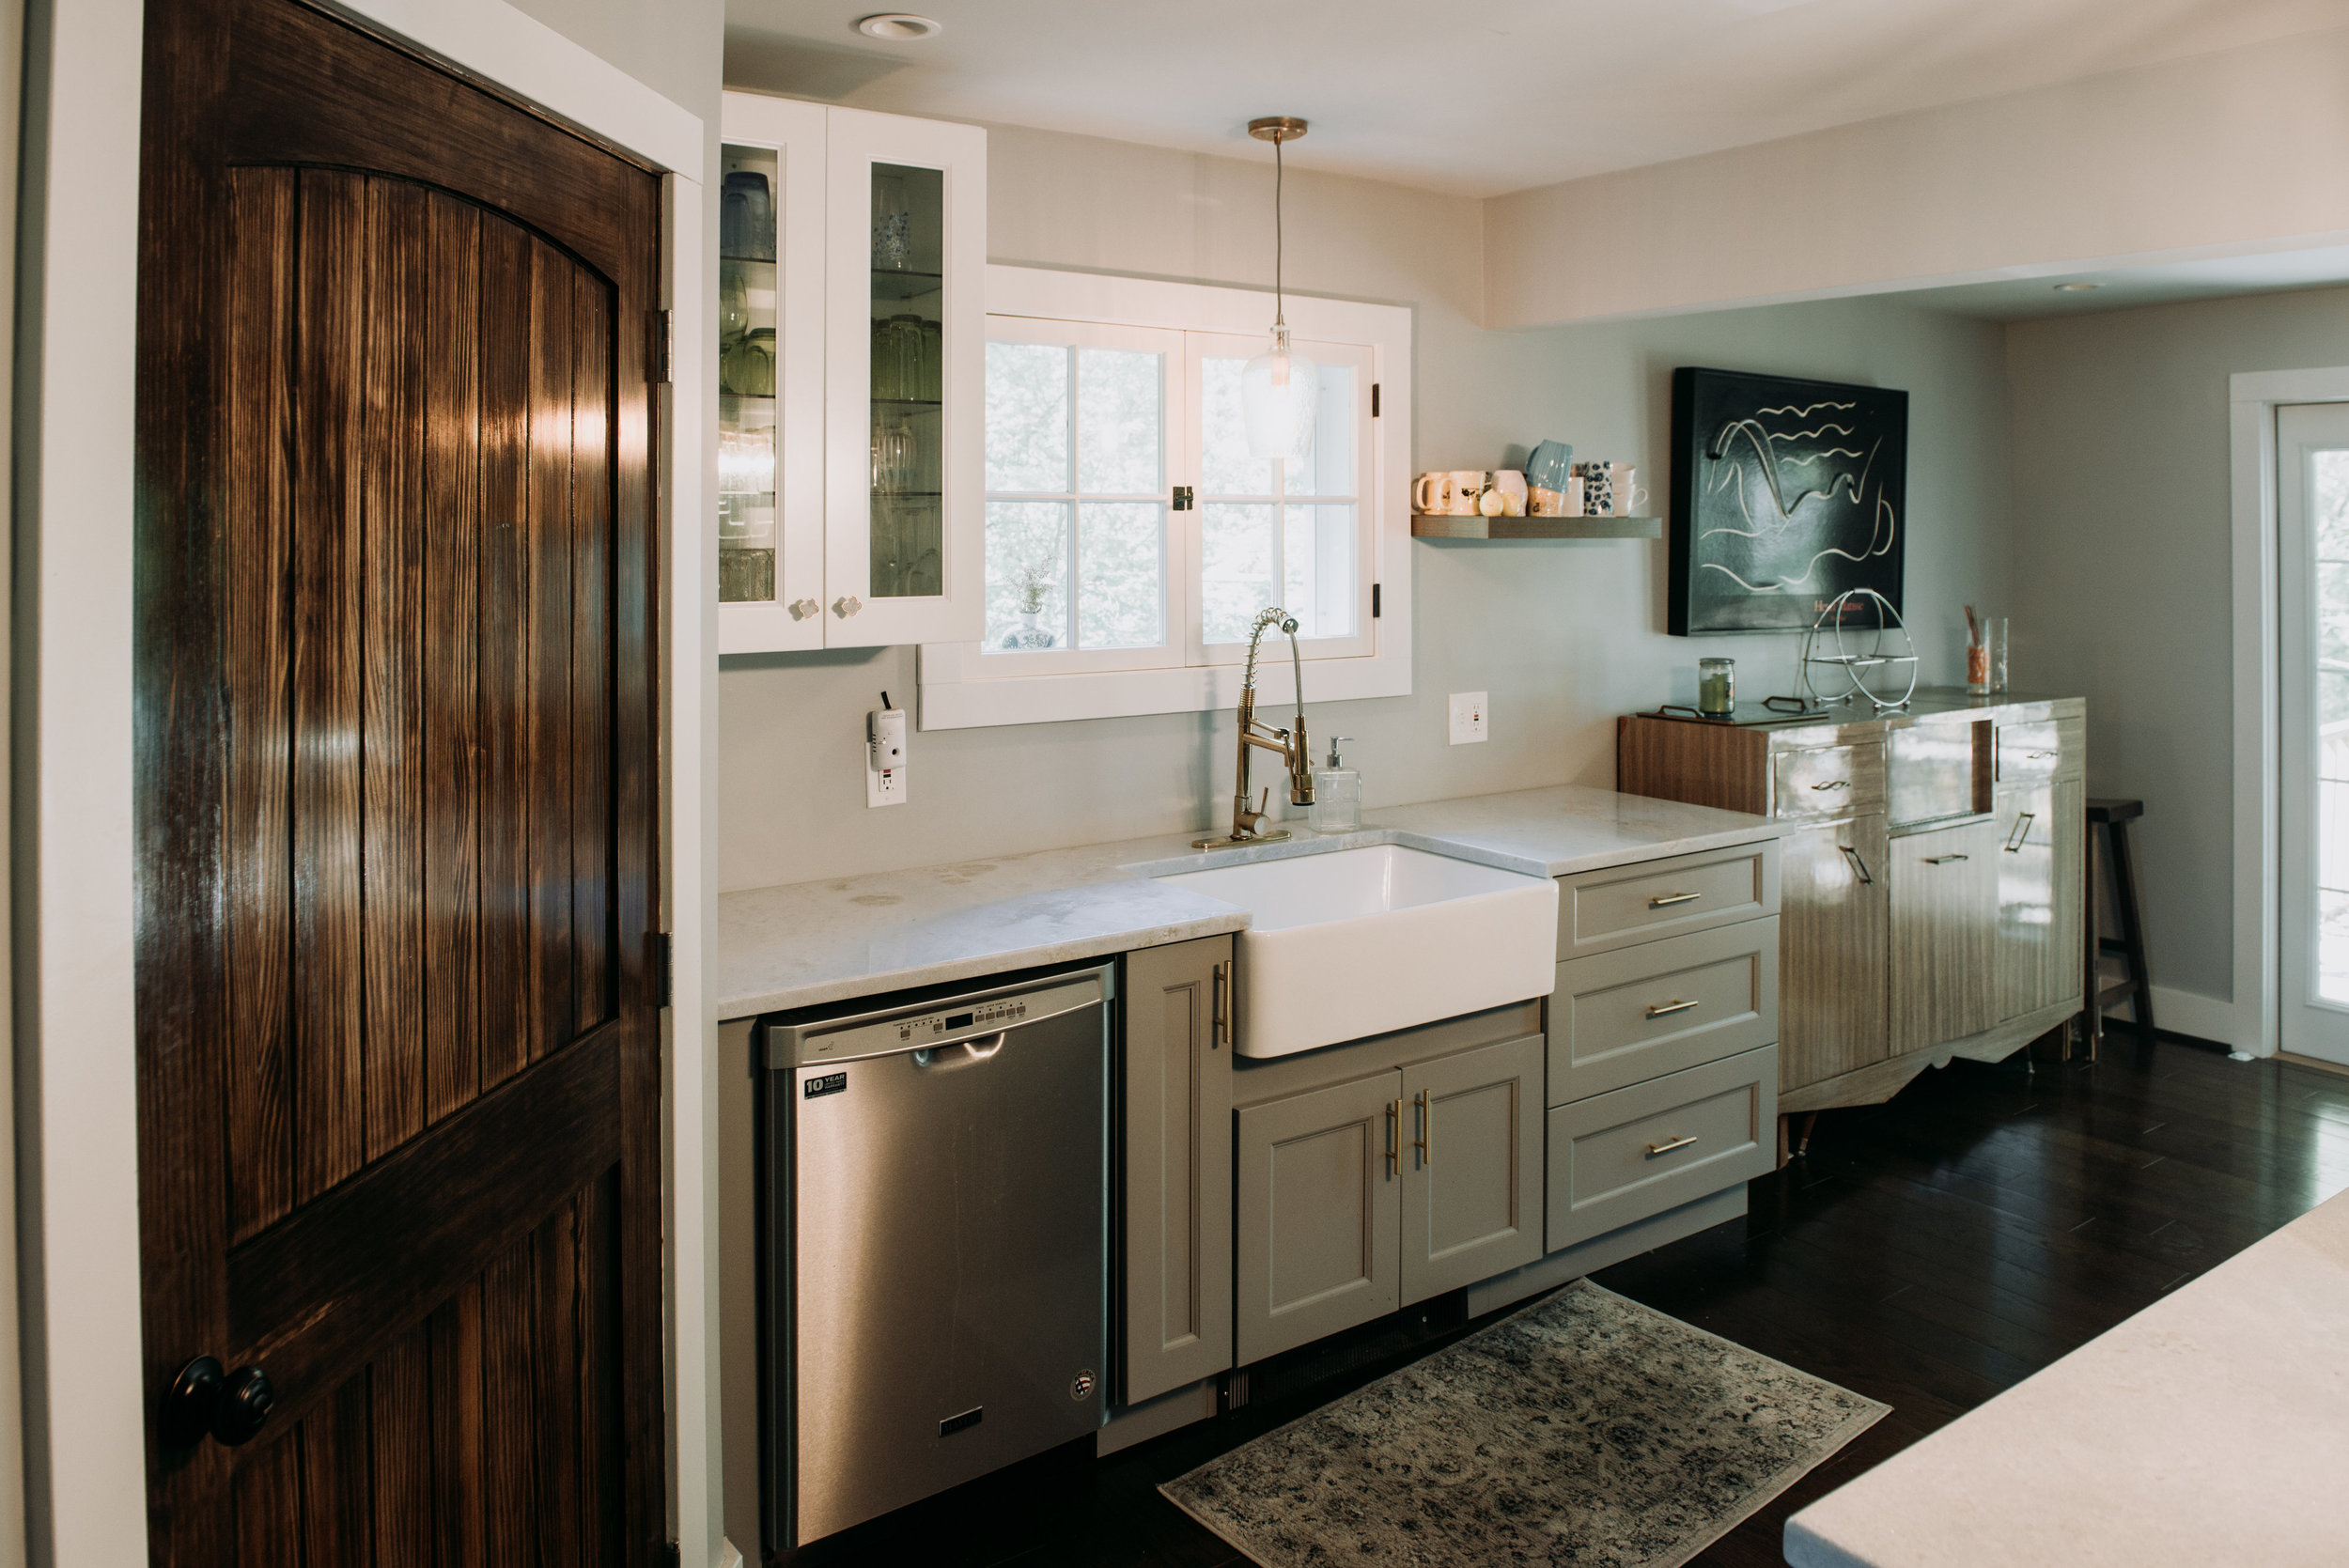 Professional Kitchen Cabinets - Buffalo, NY